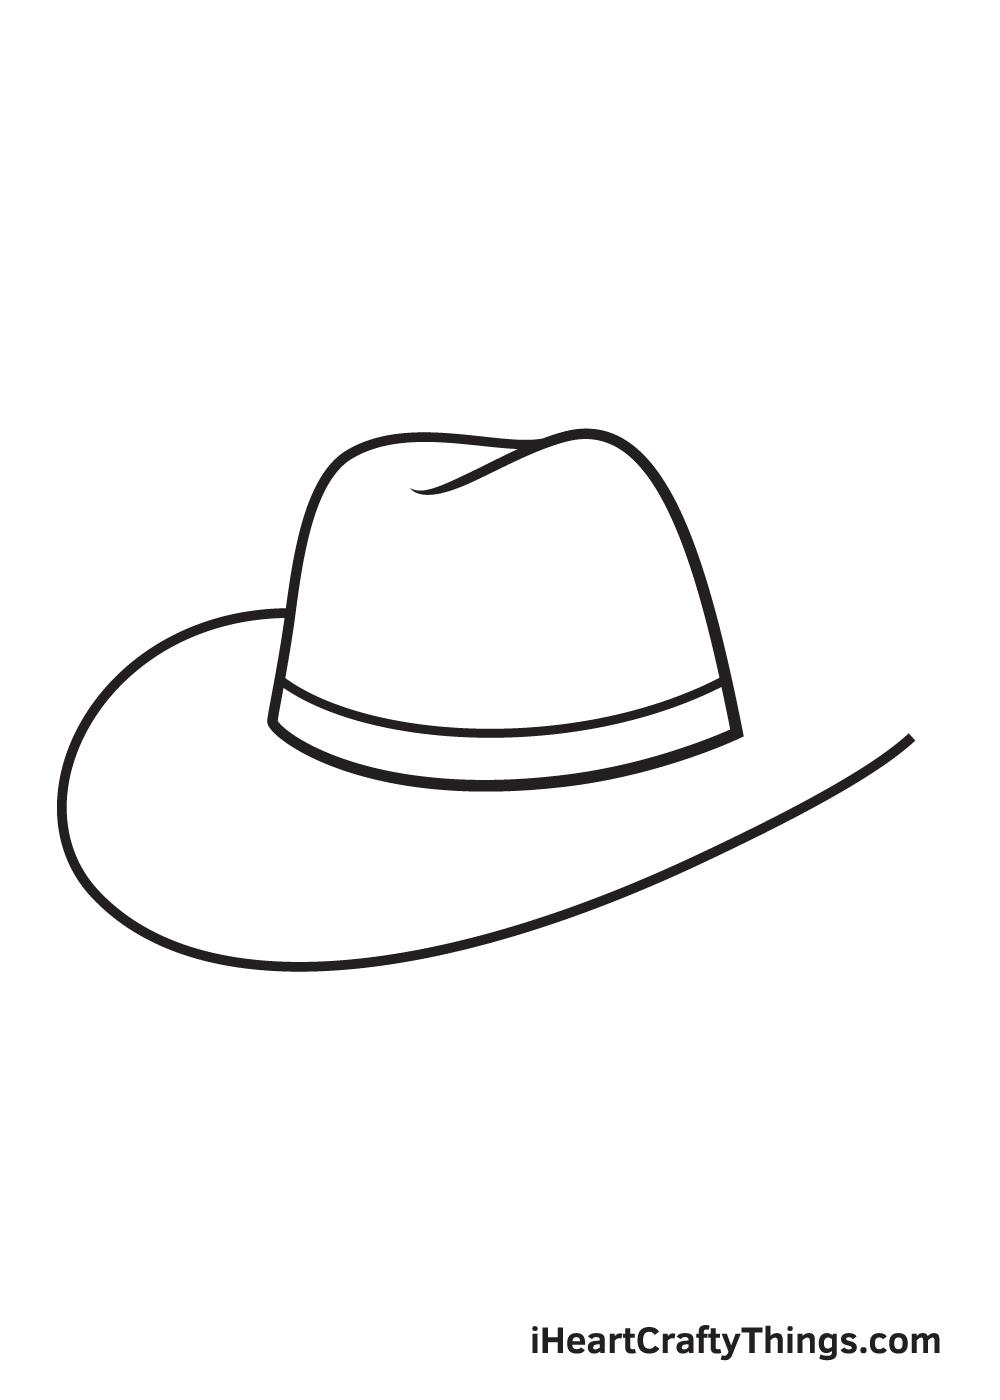 cowboy hat drawing - step 6